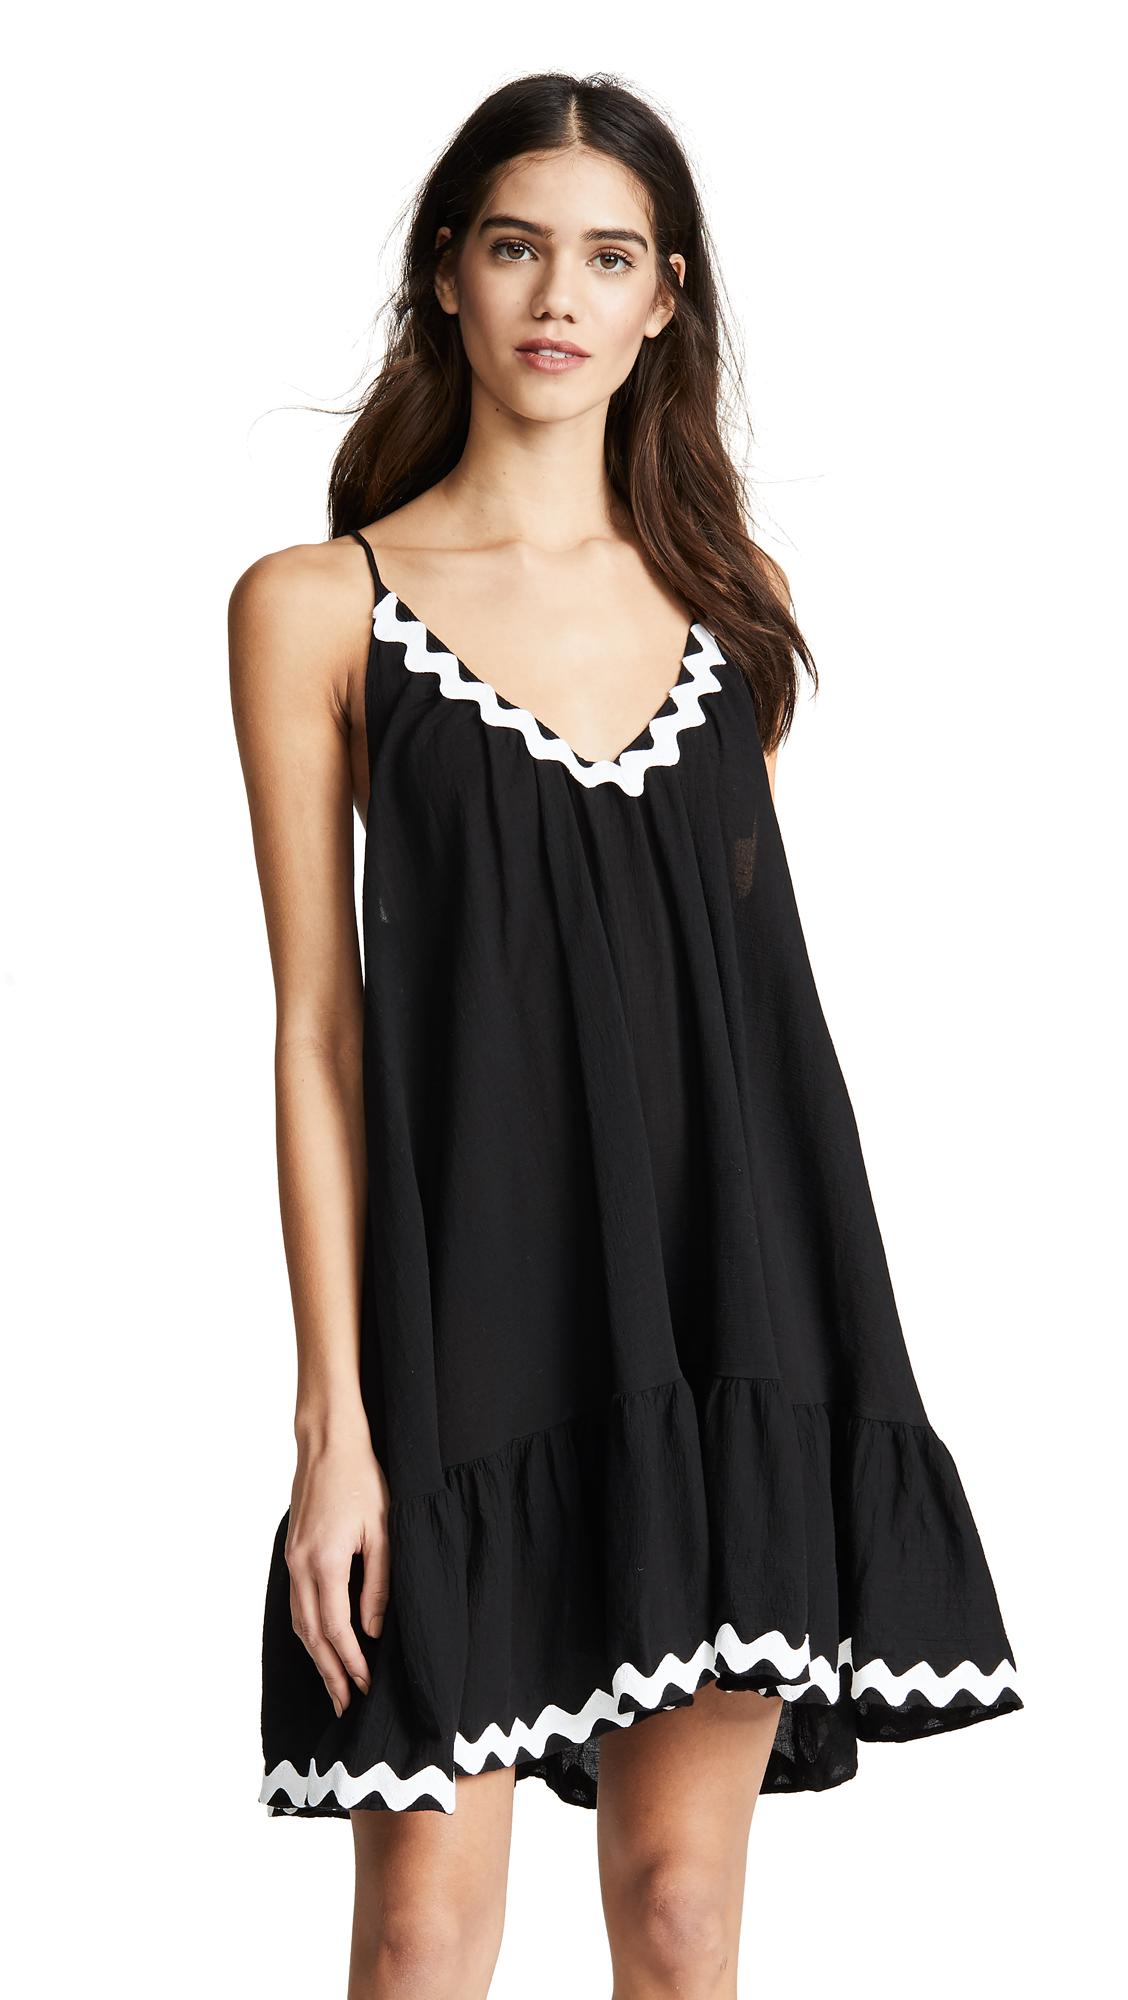 9SEED St Tropez Ruffle Mini Dress in Black/White